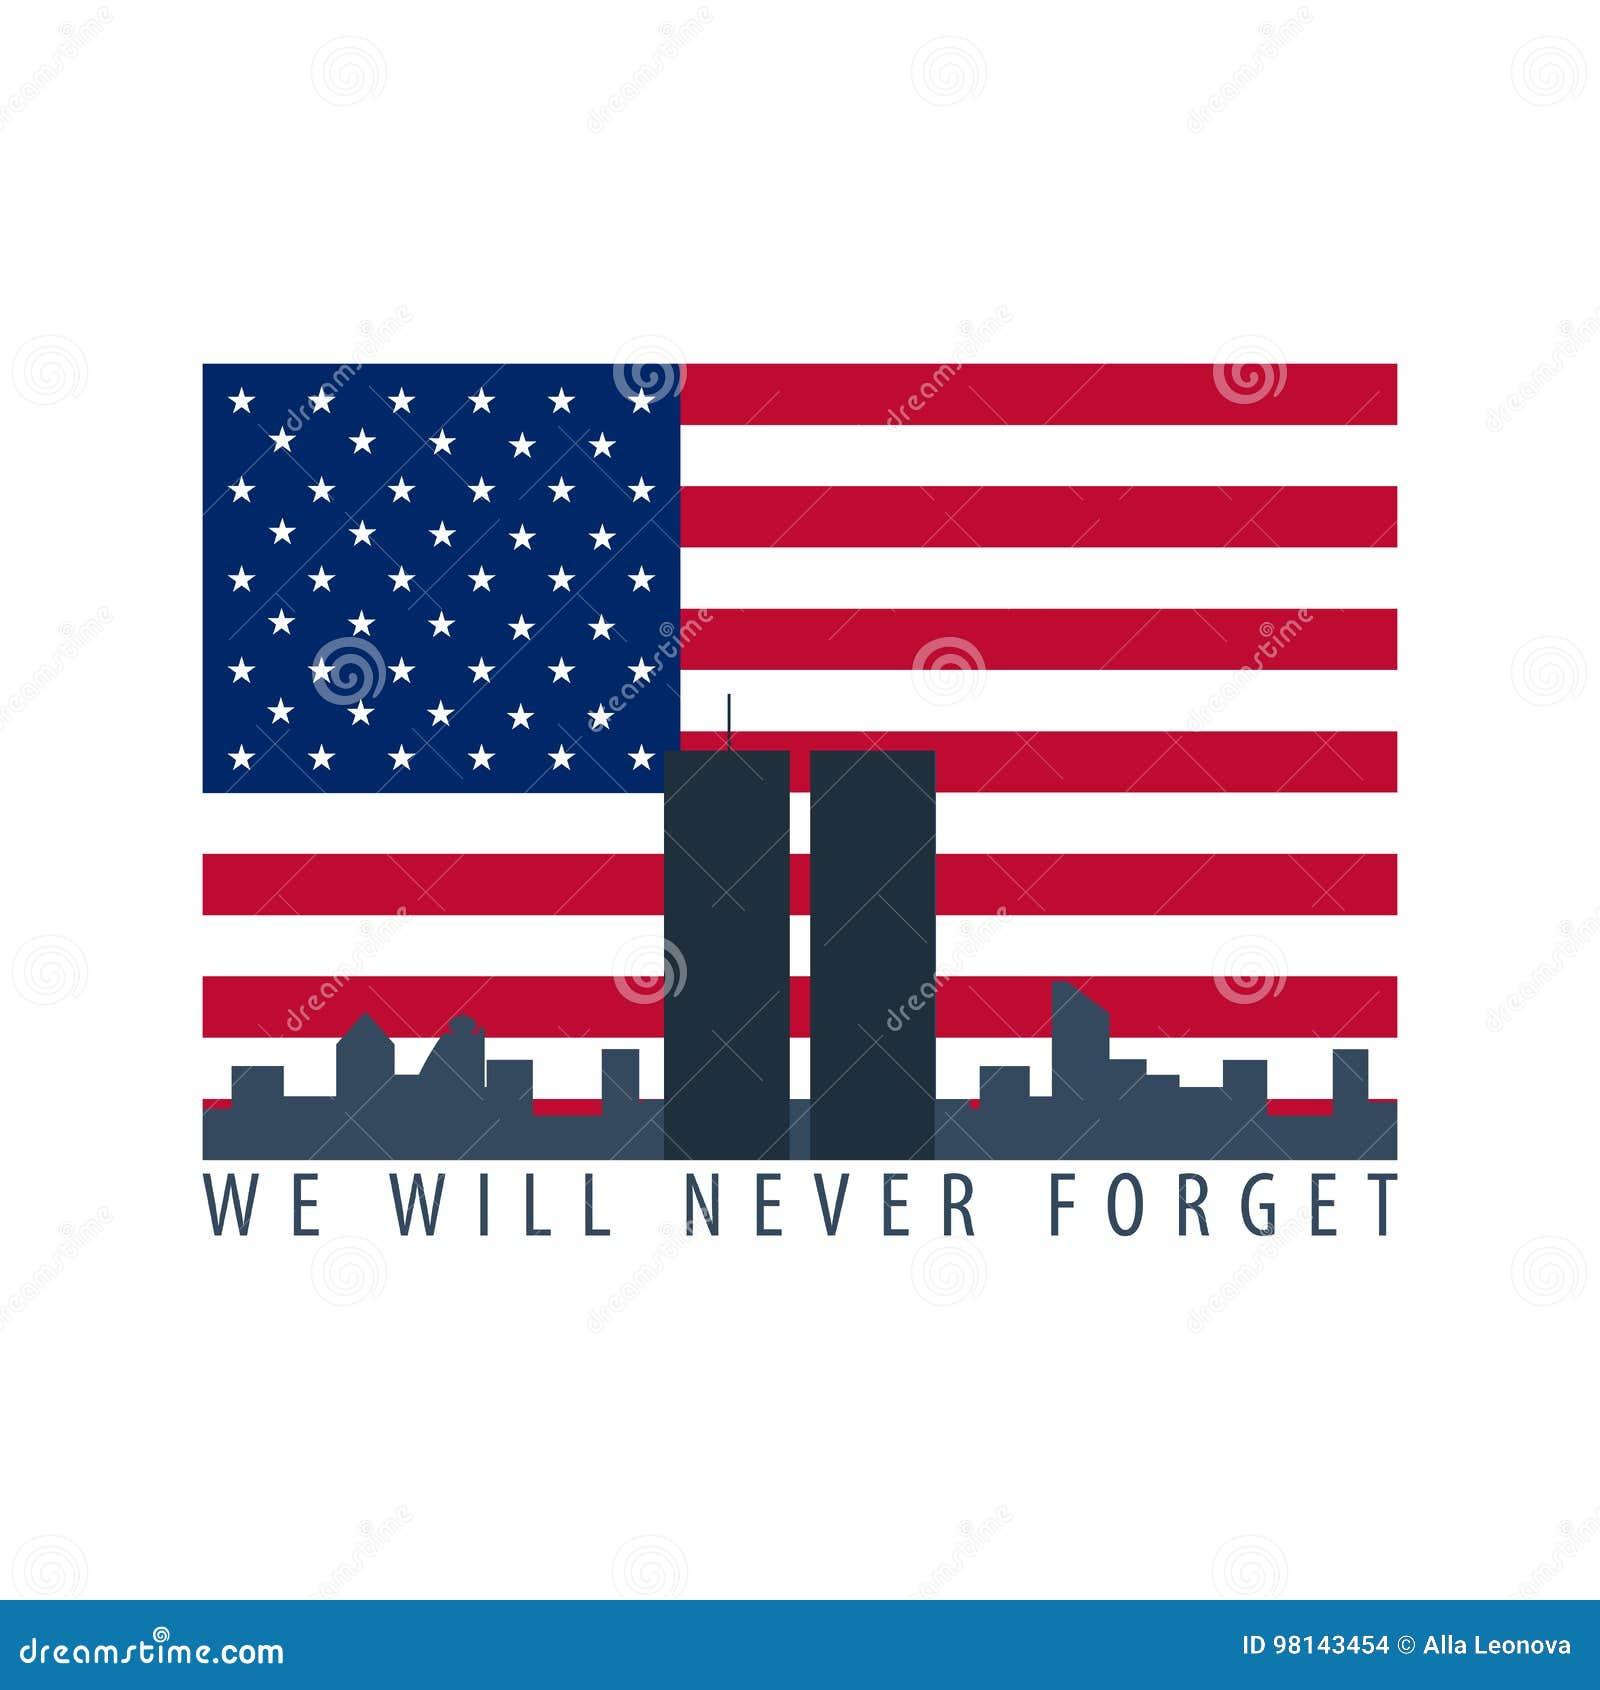 Patriot day emblems or logo. September 11. We will never forget.